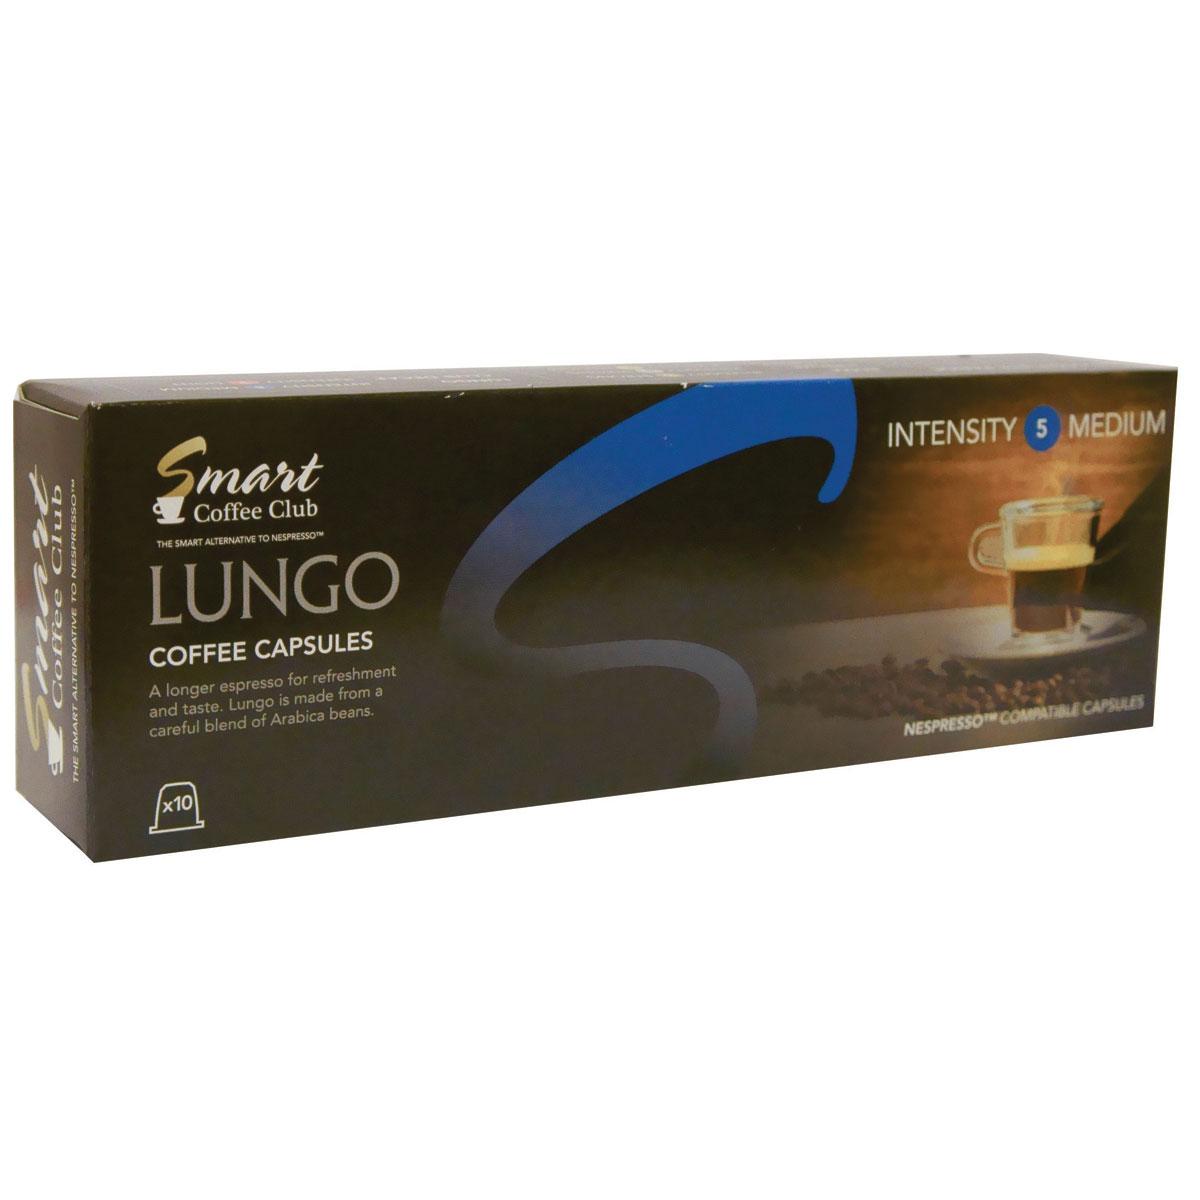 Smart Coffee Club Lungo кофе в капсулах, 10 штук капсулы для кофемашин smart coffee club roma 10 капсул